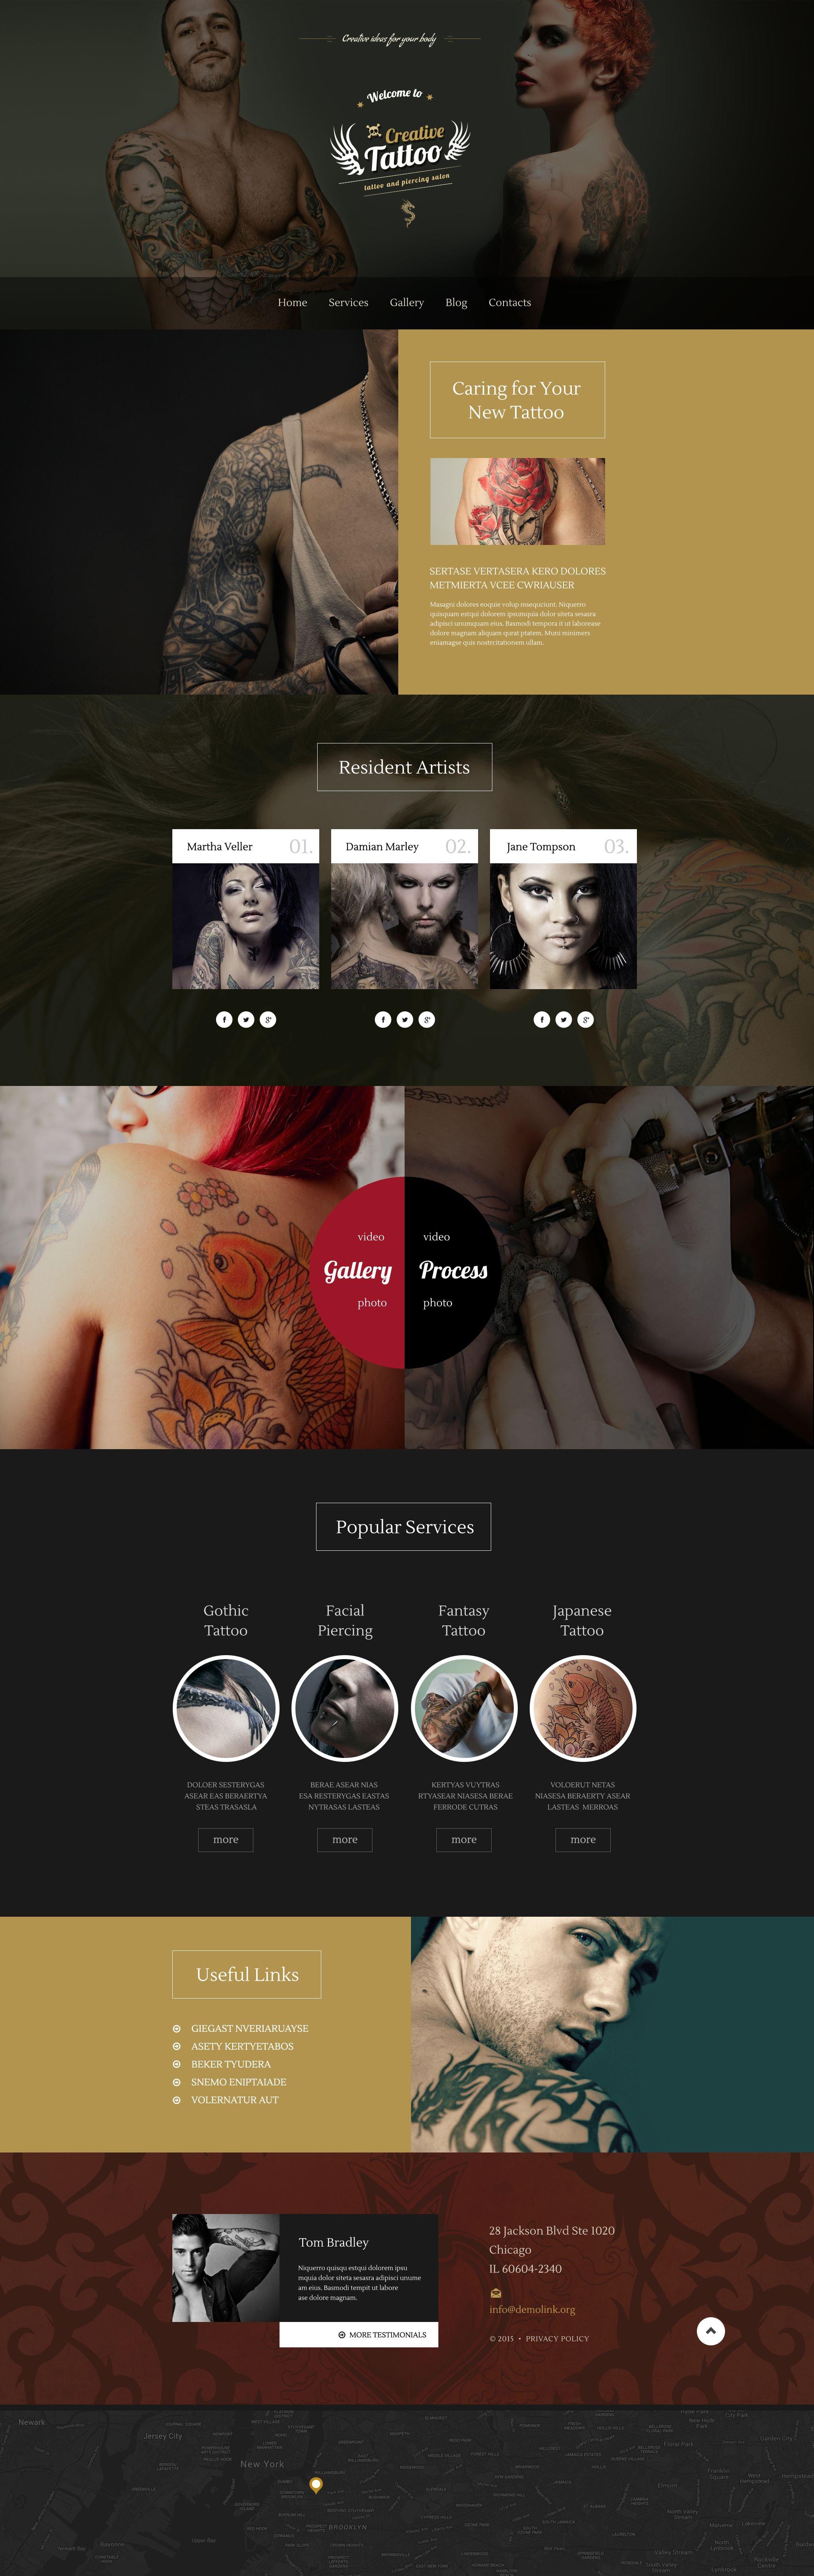 Creative Tattoo №55046 - скриншот